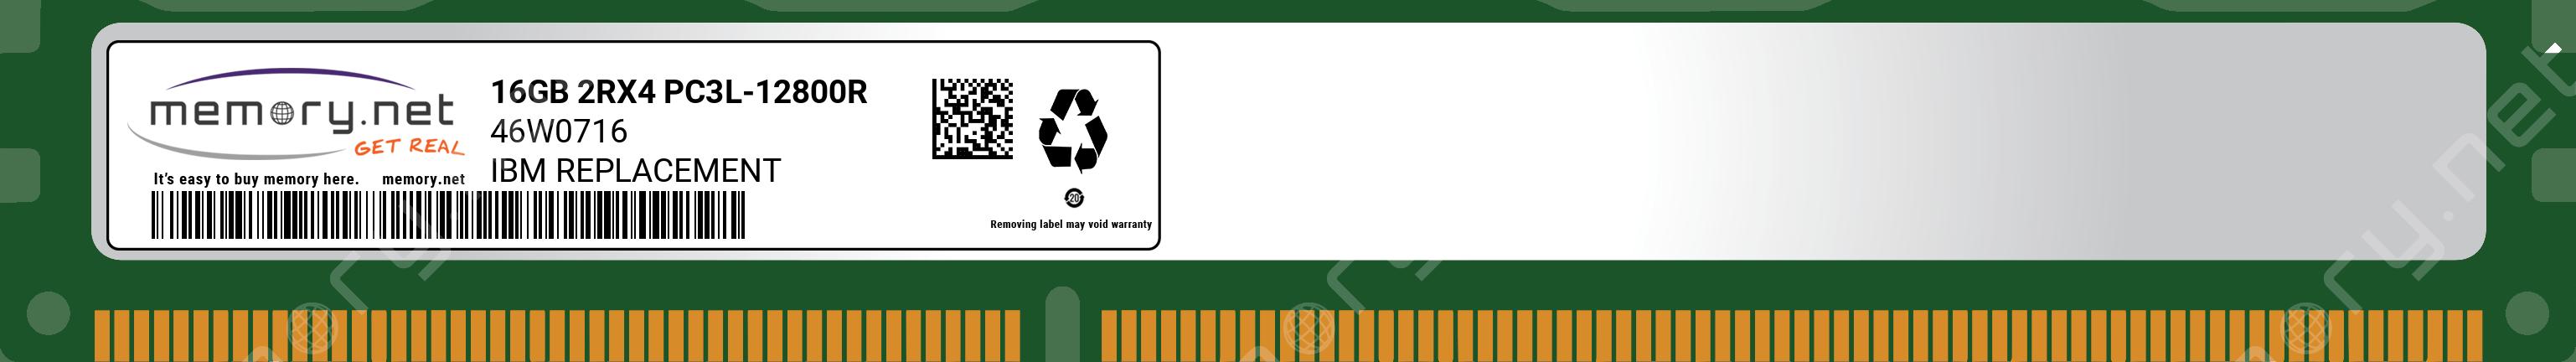 46W0716